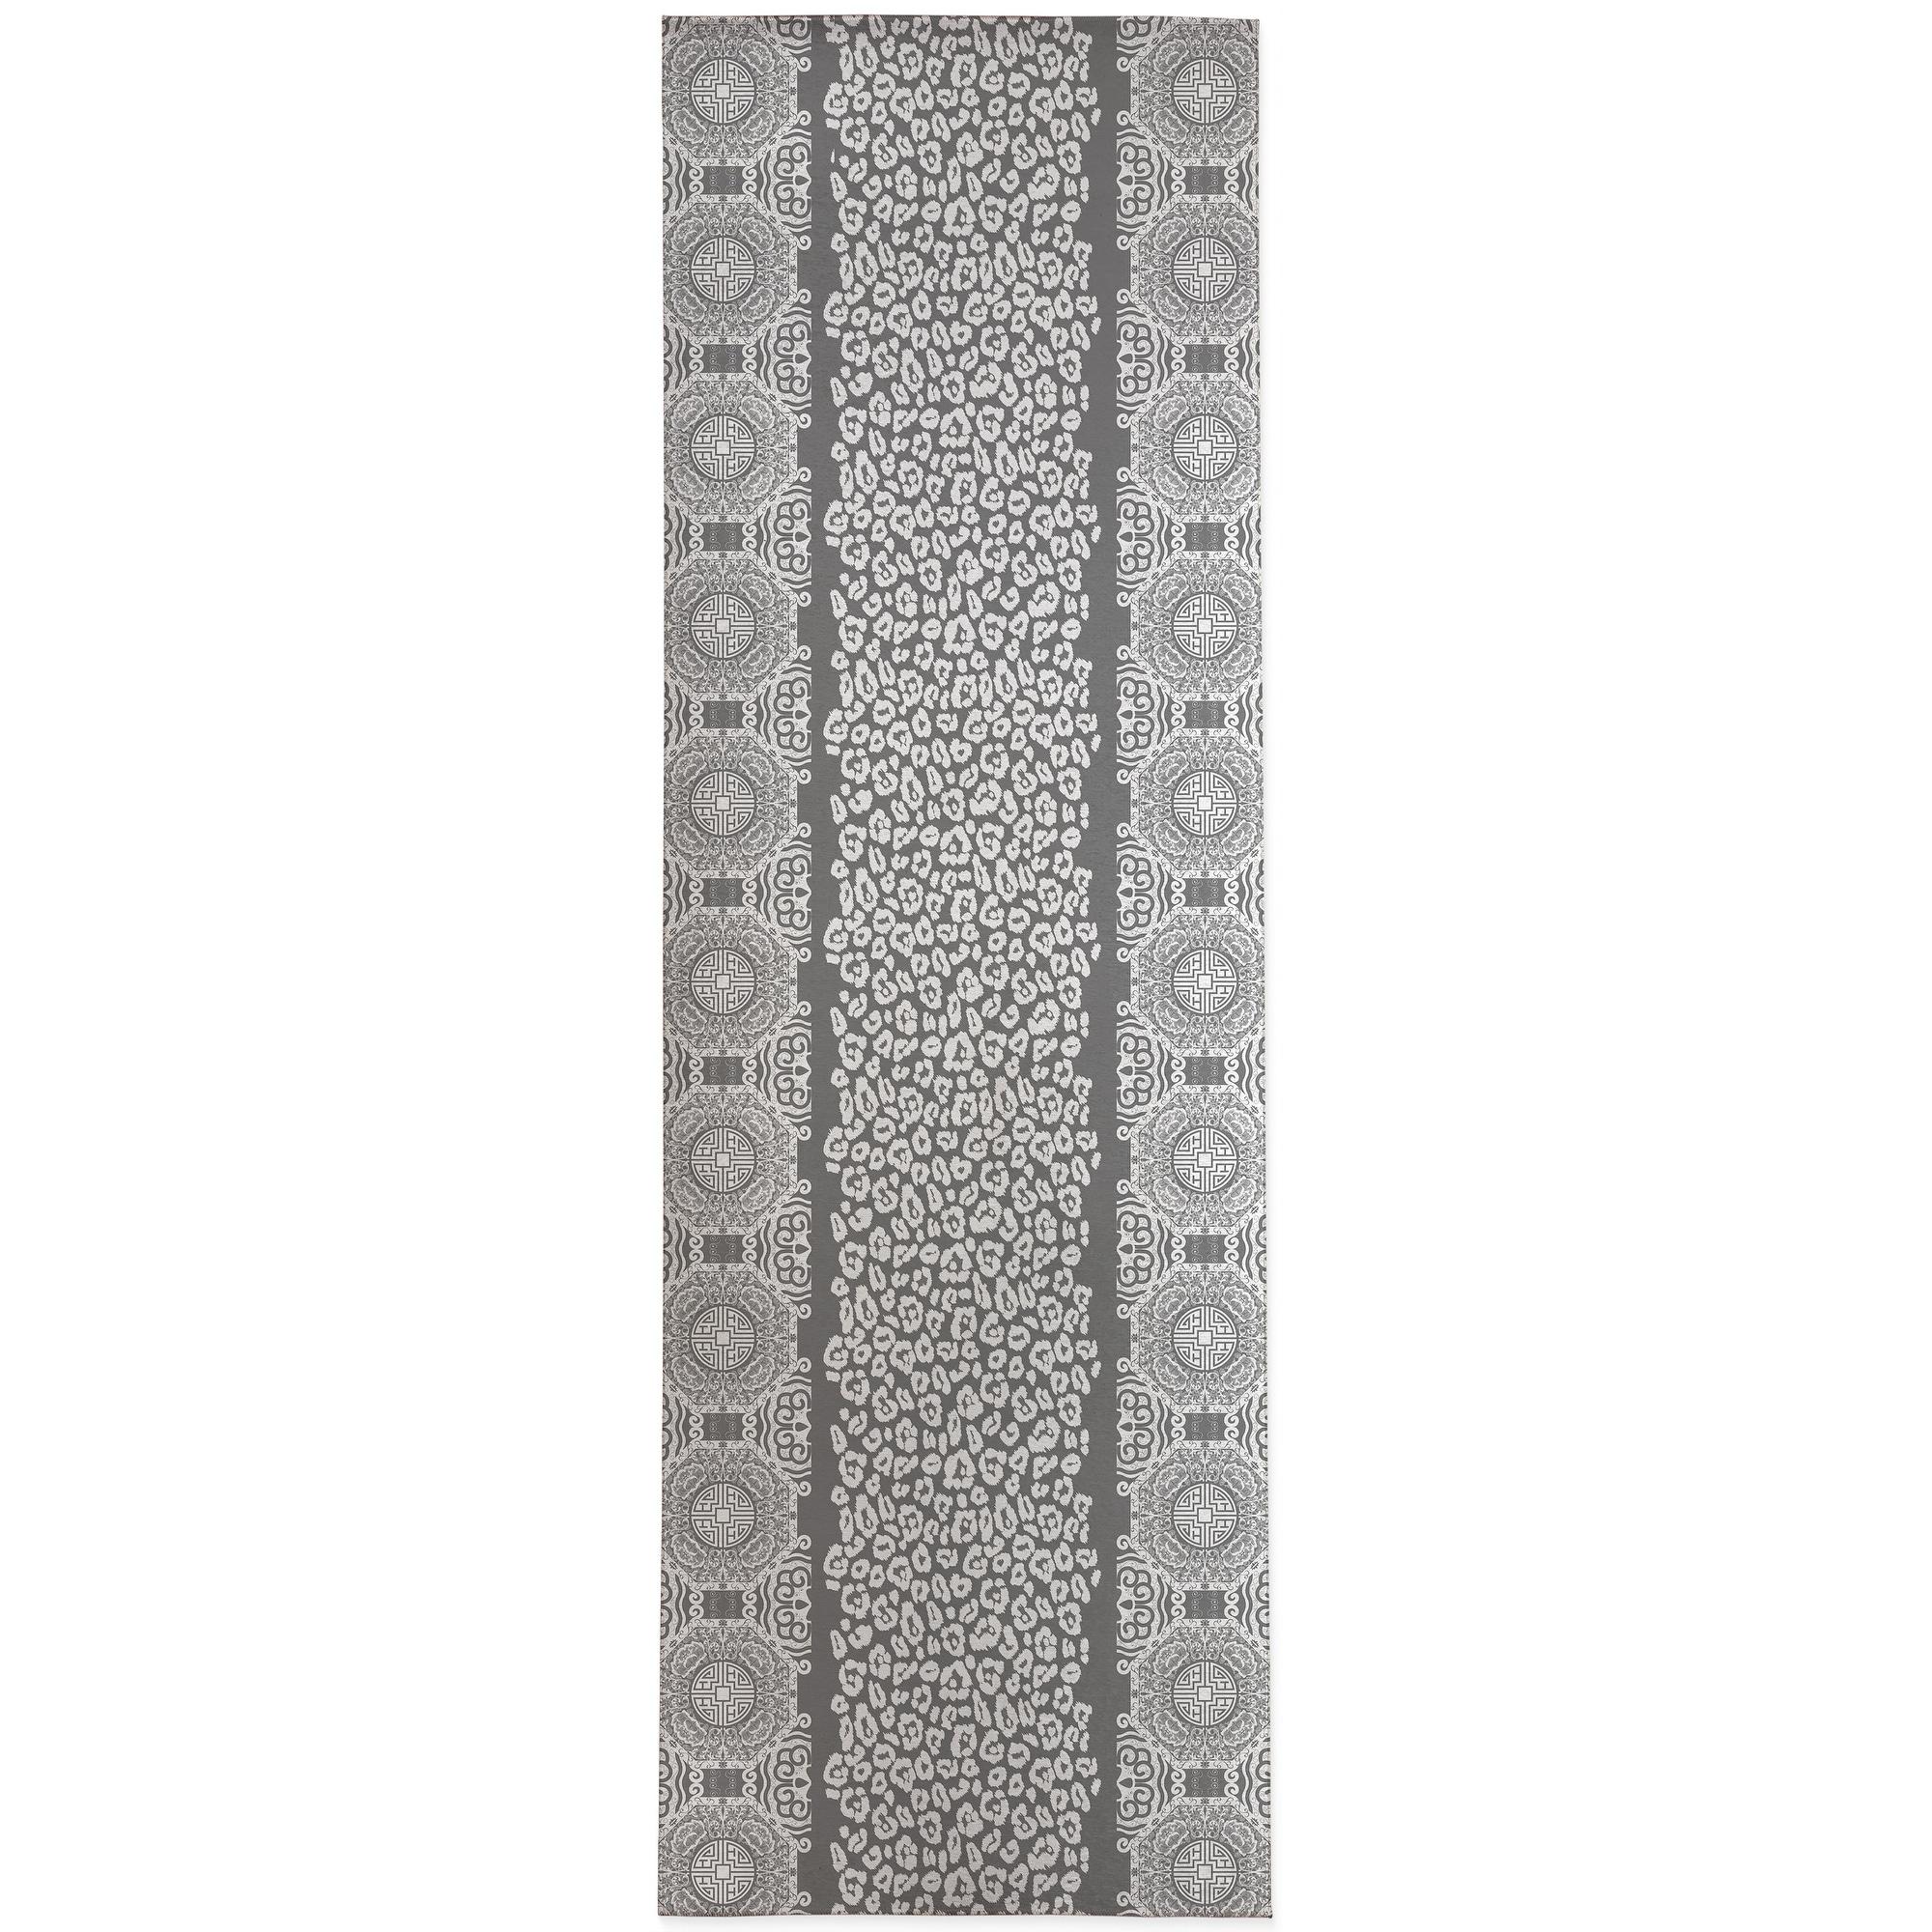 Mingleopard Grey White Area Rug By Kavka Designs Overstock 31453256